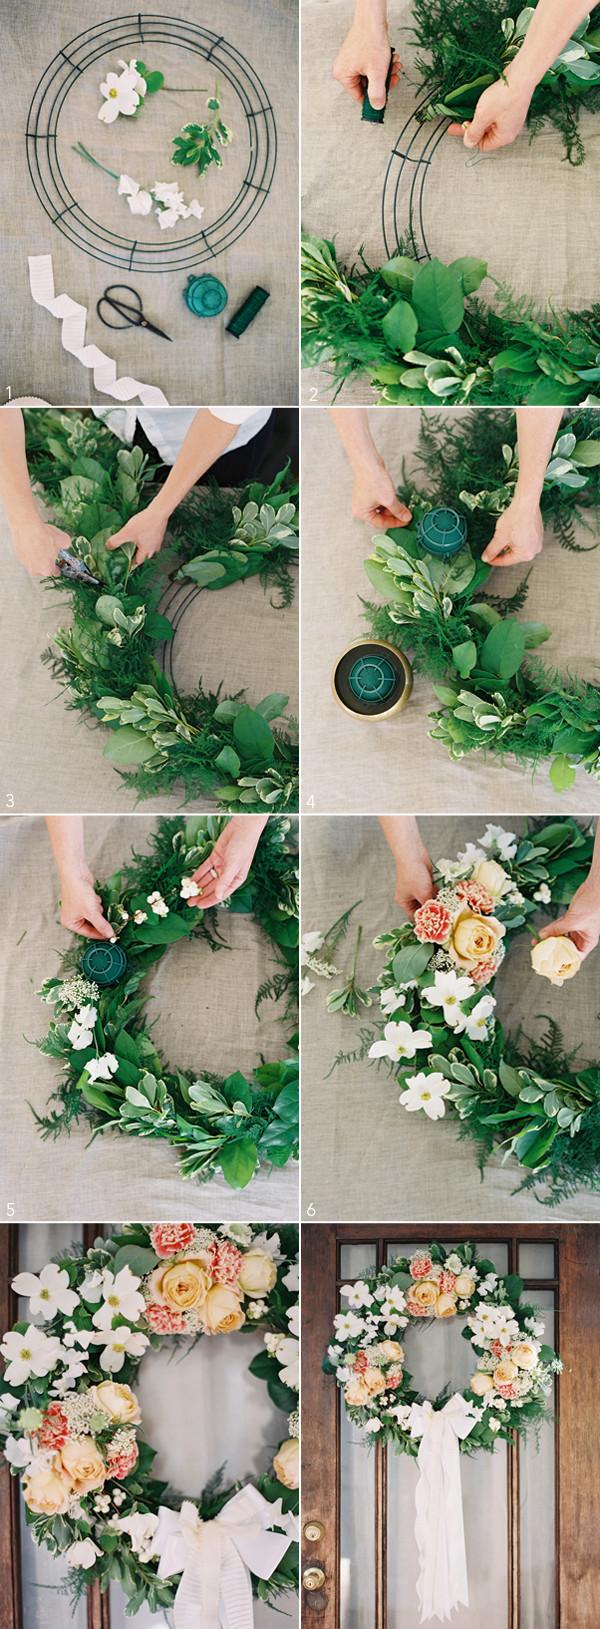 Best ideas about DIY Wedding Decor . Save or Pin DIY Wedding Wreath ce Wed Now.